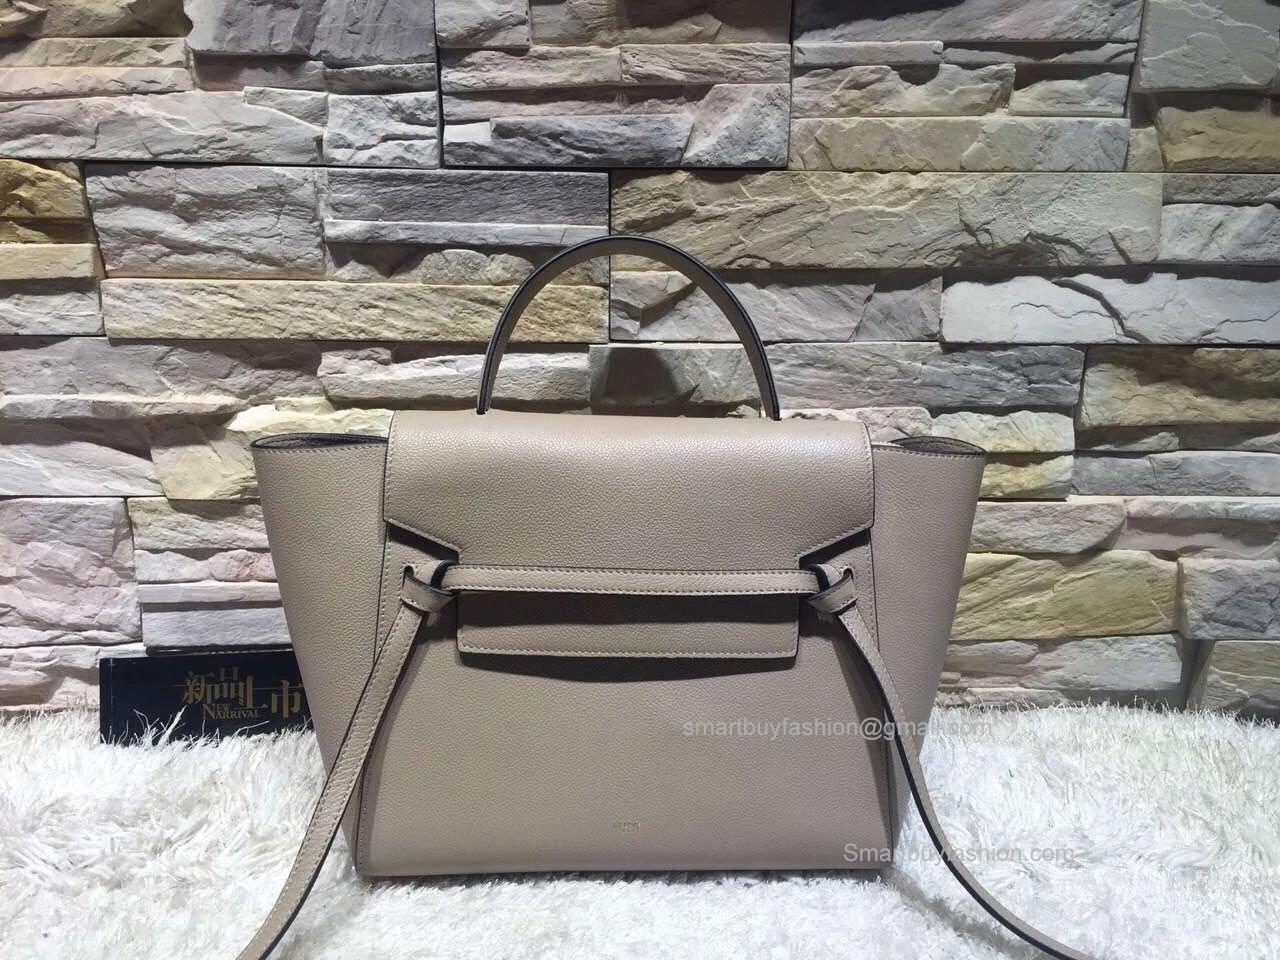 1894314bc3c0 ... Replica Celine Mini Belt Bag in Grey Baby Grained Leather